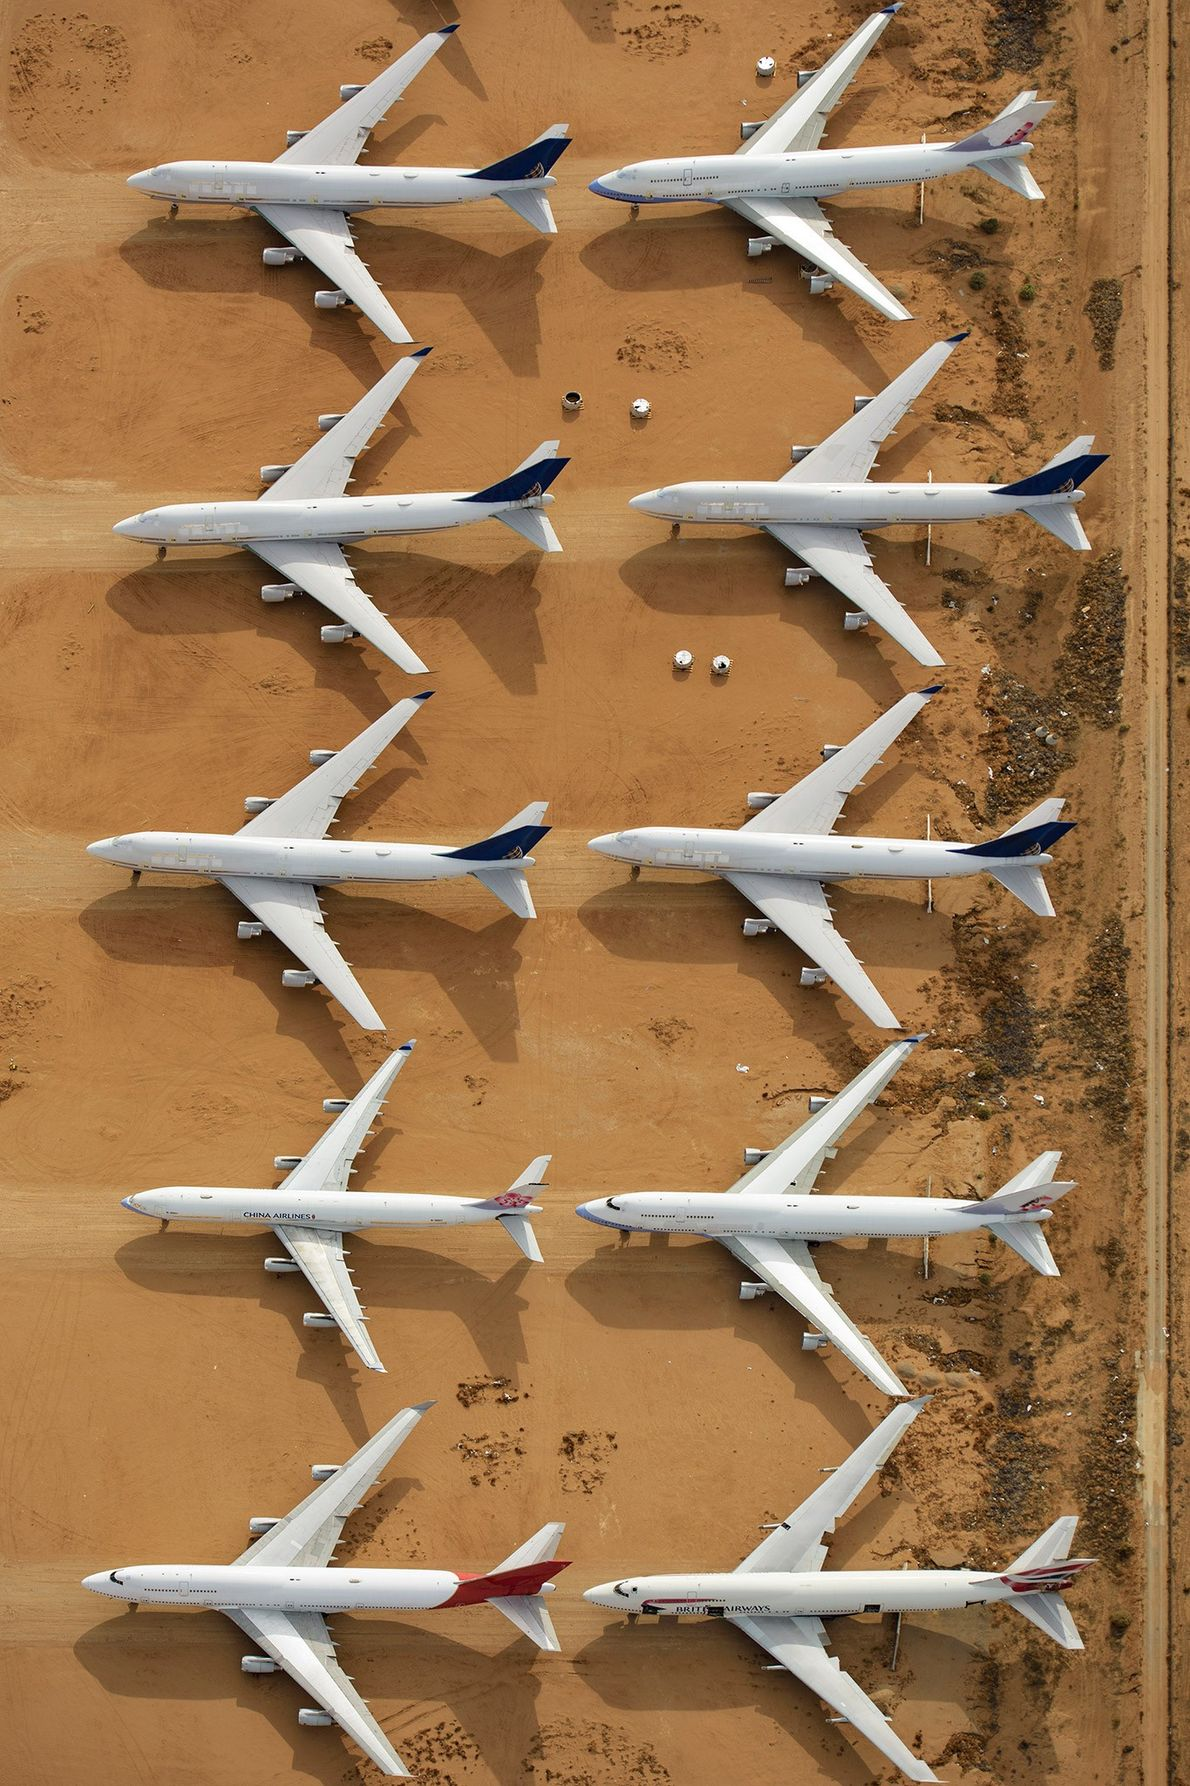 Aviones retirados